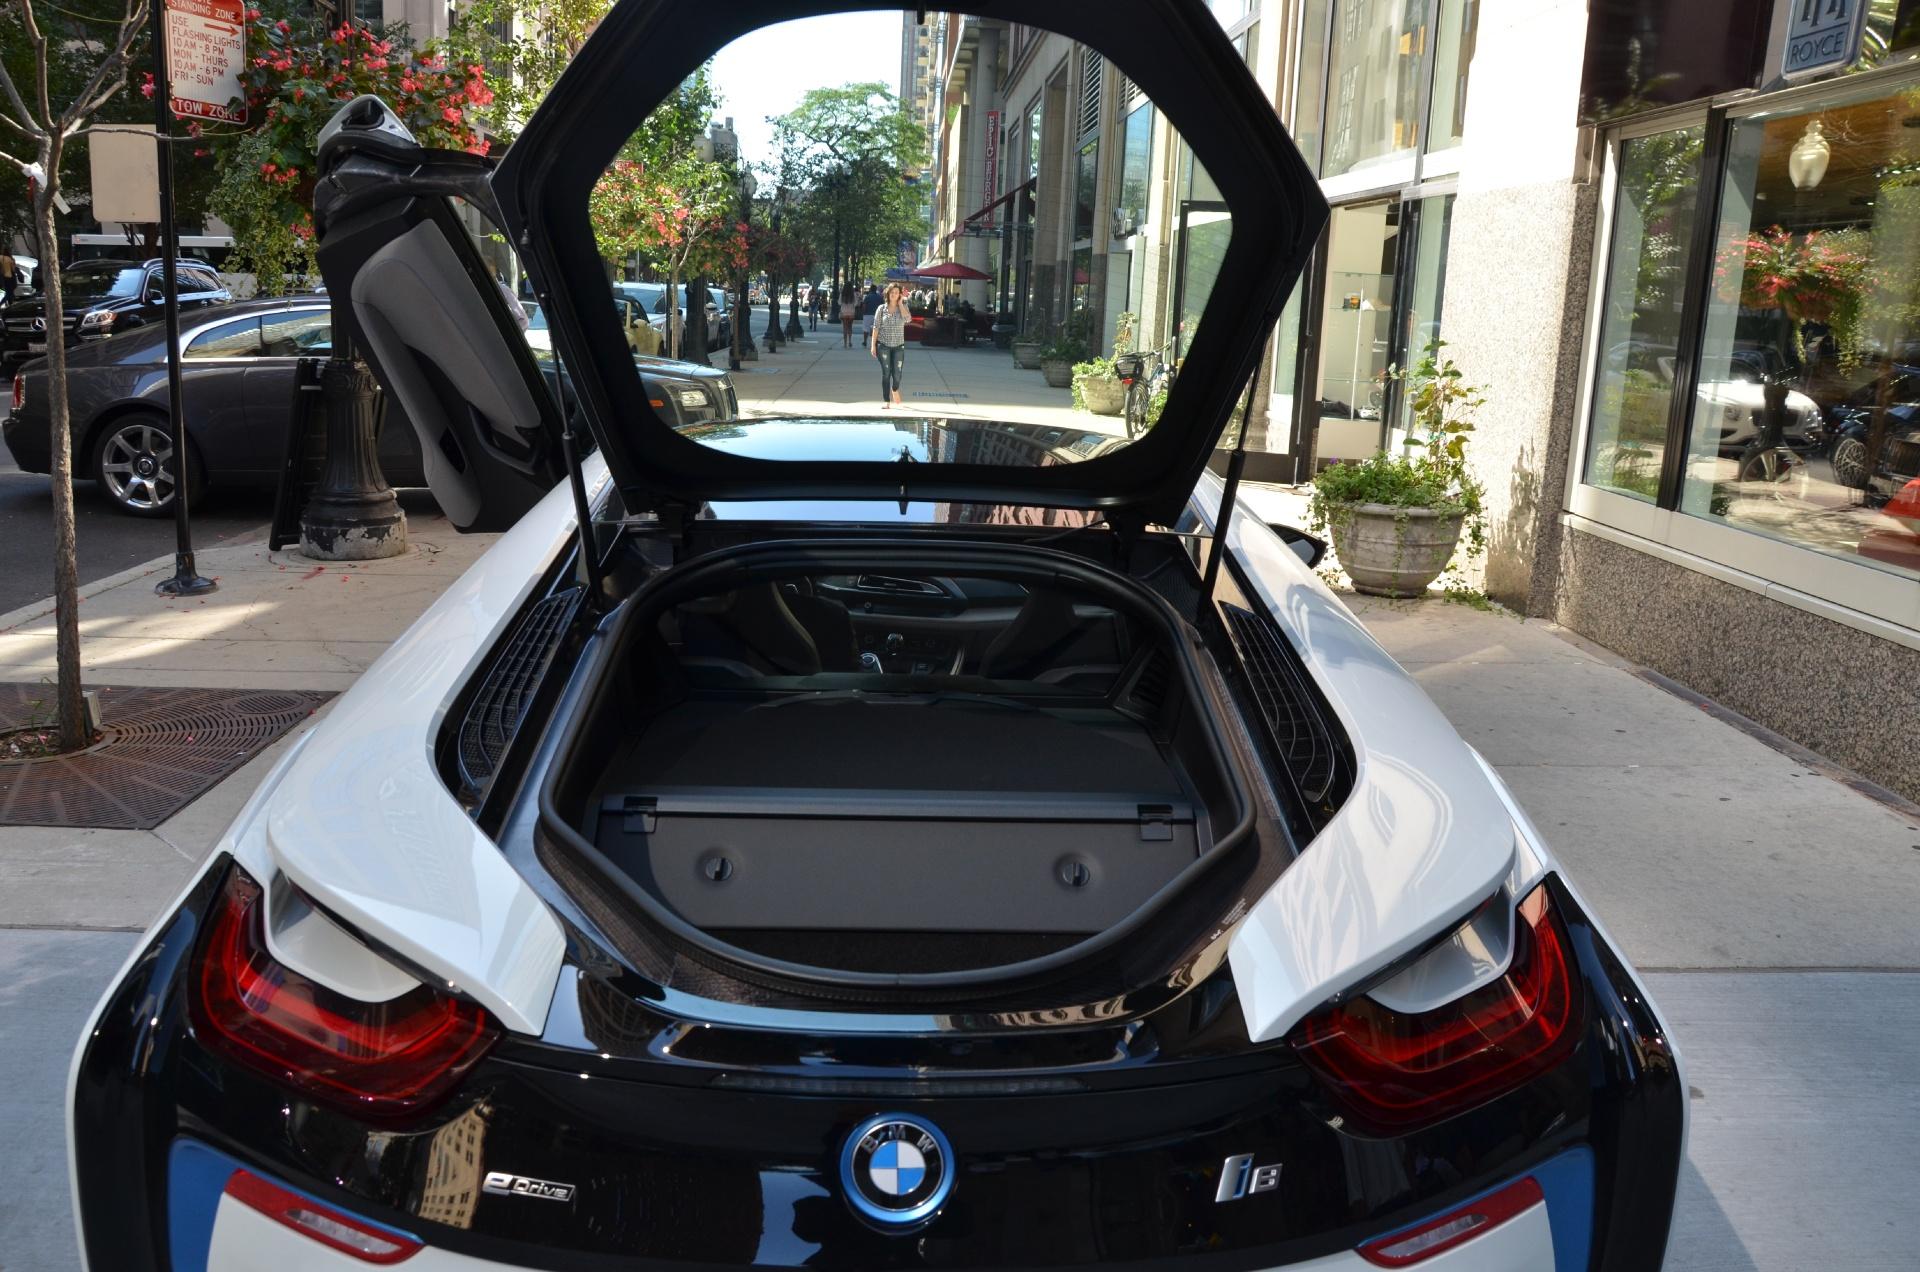 2015 Bmw I8 Stock 91143 For Sale Near Chicago Il Il Bmw Dealer